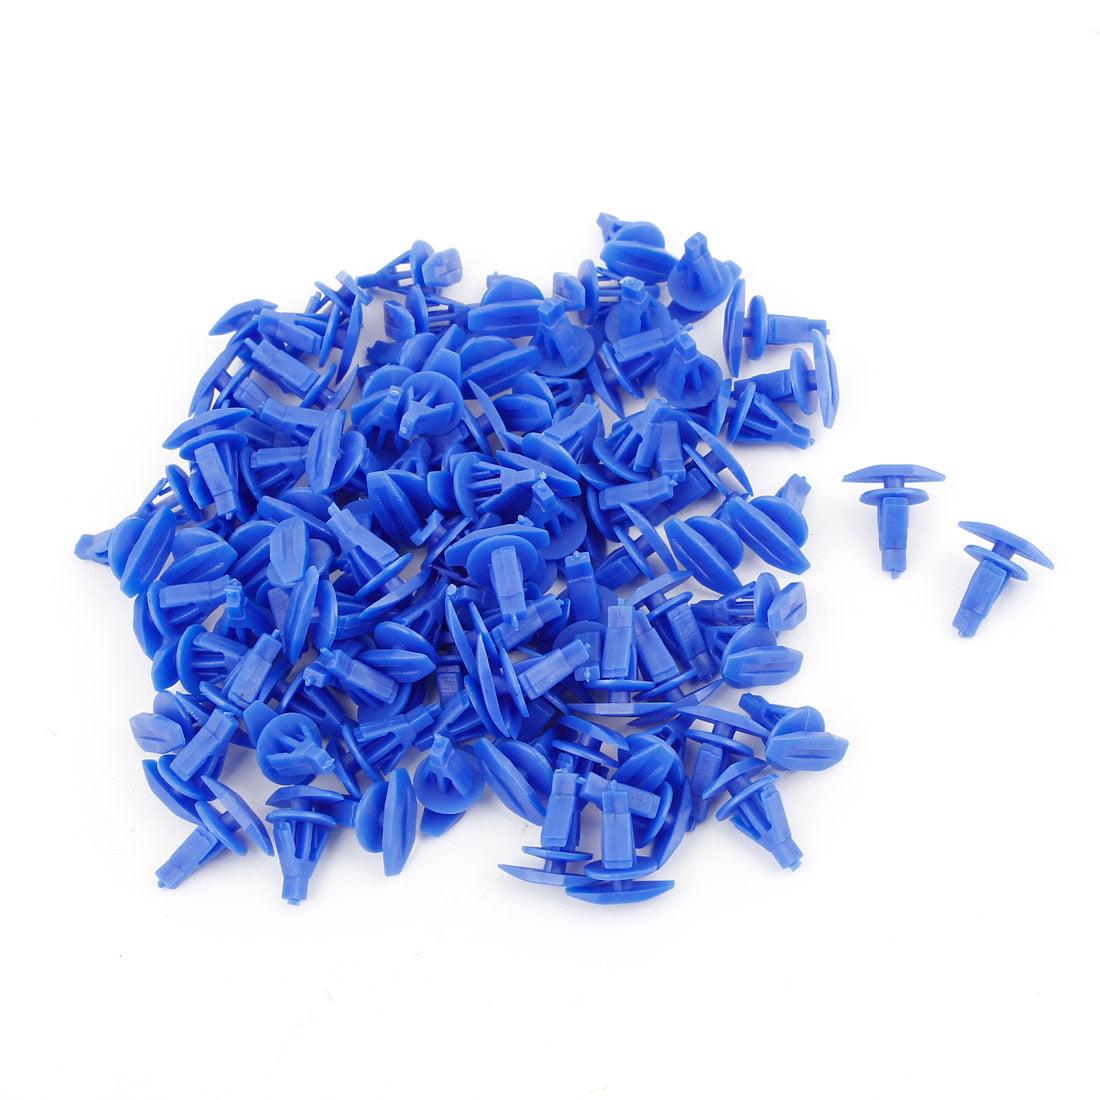 Unique Bargains 15mm Dia Blue Fastener Rivet Push in Type Retainer Bumper Clips Blue 100 Pcs